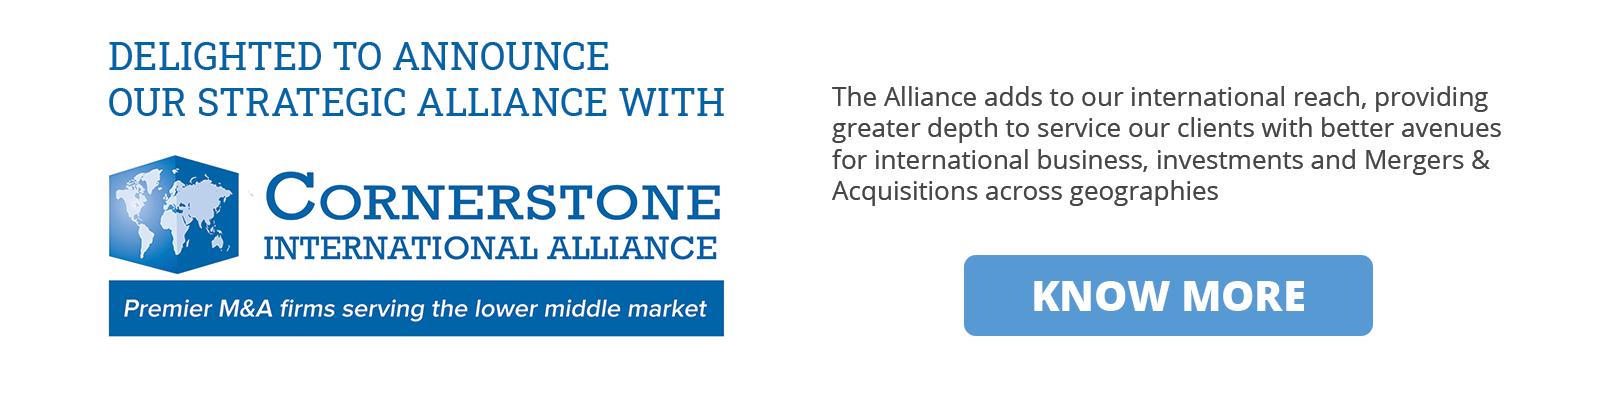 cornerstone affiliated advisory and strategic firm in india